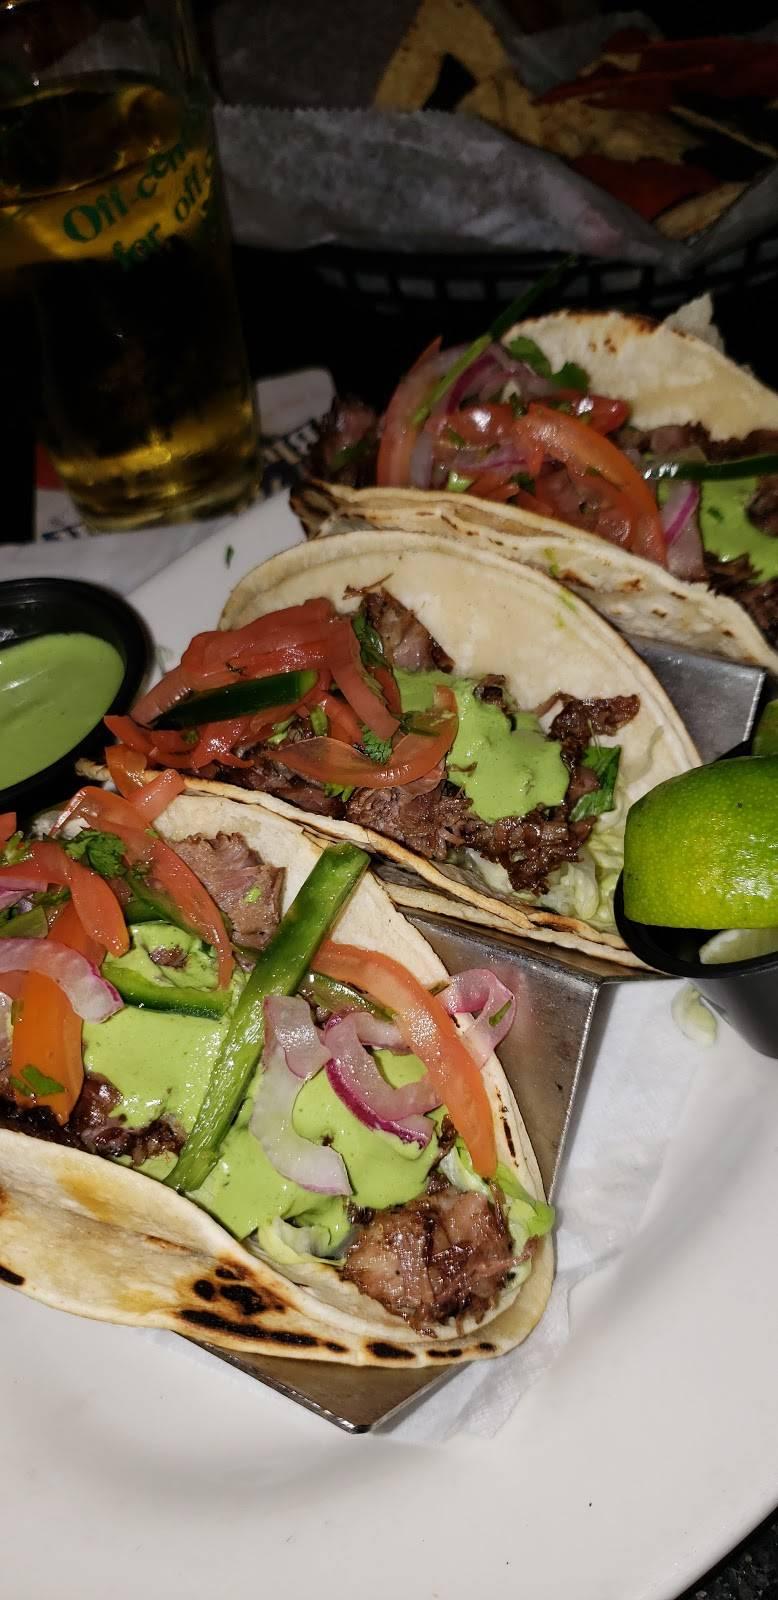 Croxleys Ale House - Brooklyn | restaurant | 63 Grand St, Brooklyn, NY 11249, USA | 7183874290 OR +1 718-387-4290